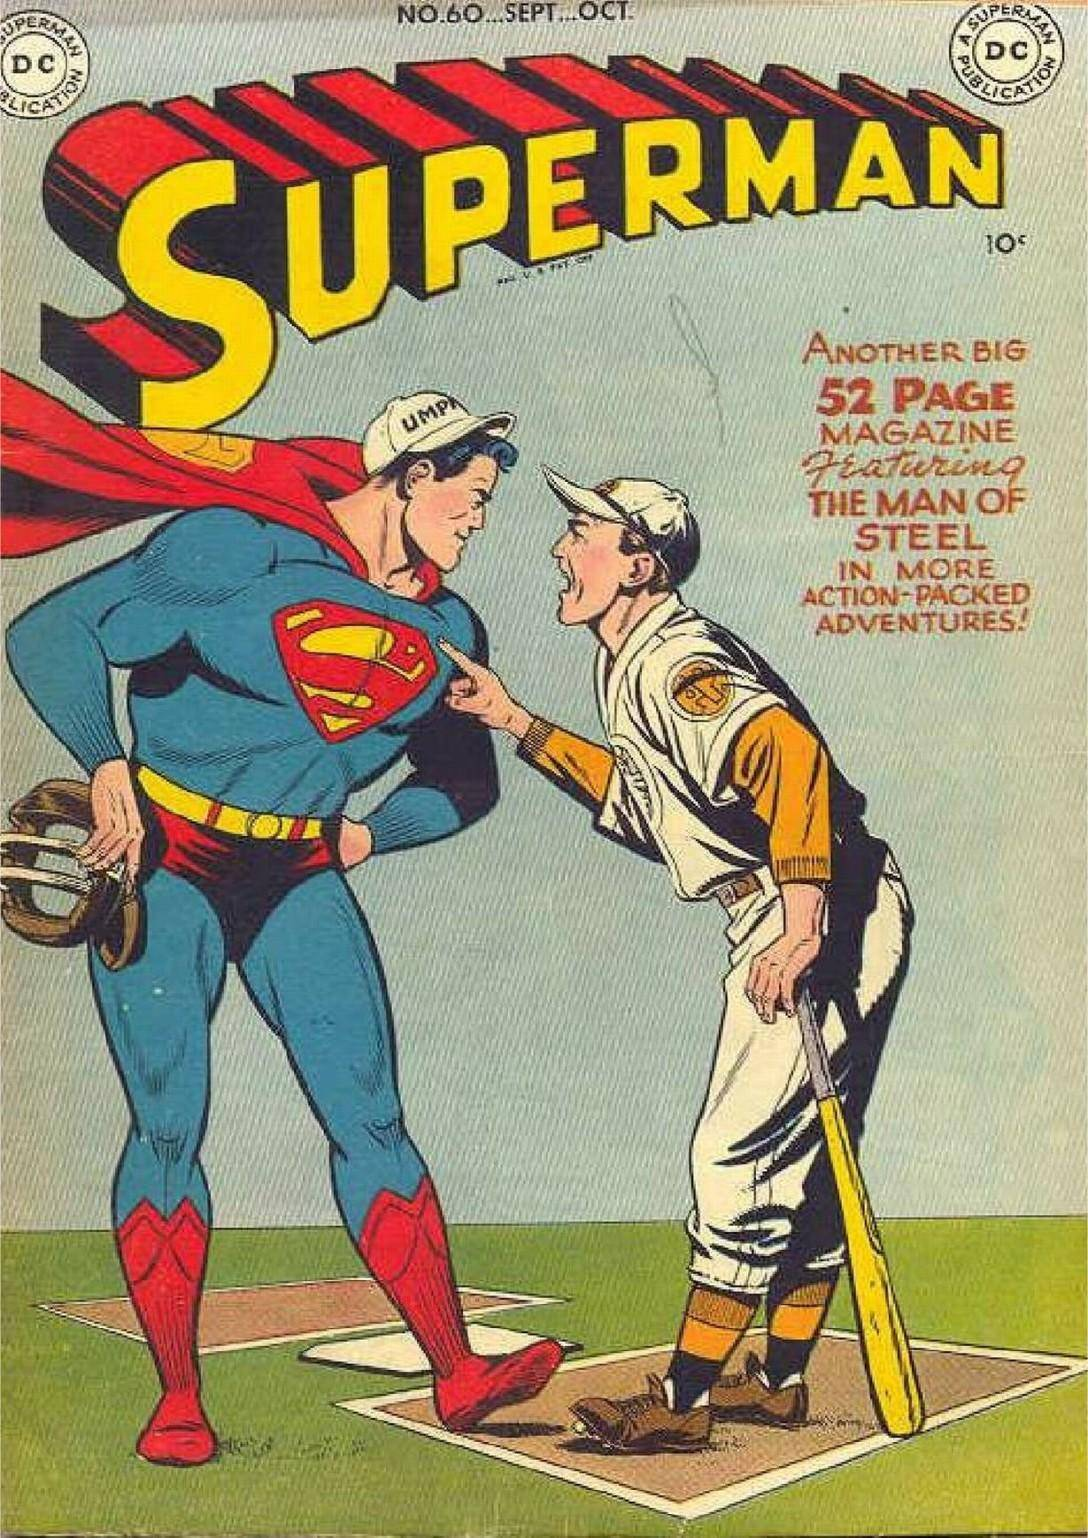 Superman 1939-1955 [80 of 121] [1949-10] Superman 060 ctc cbz